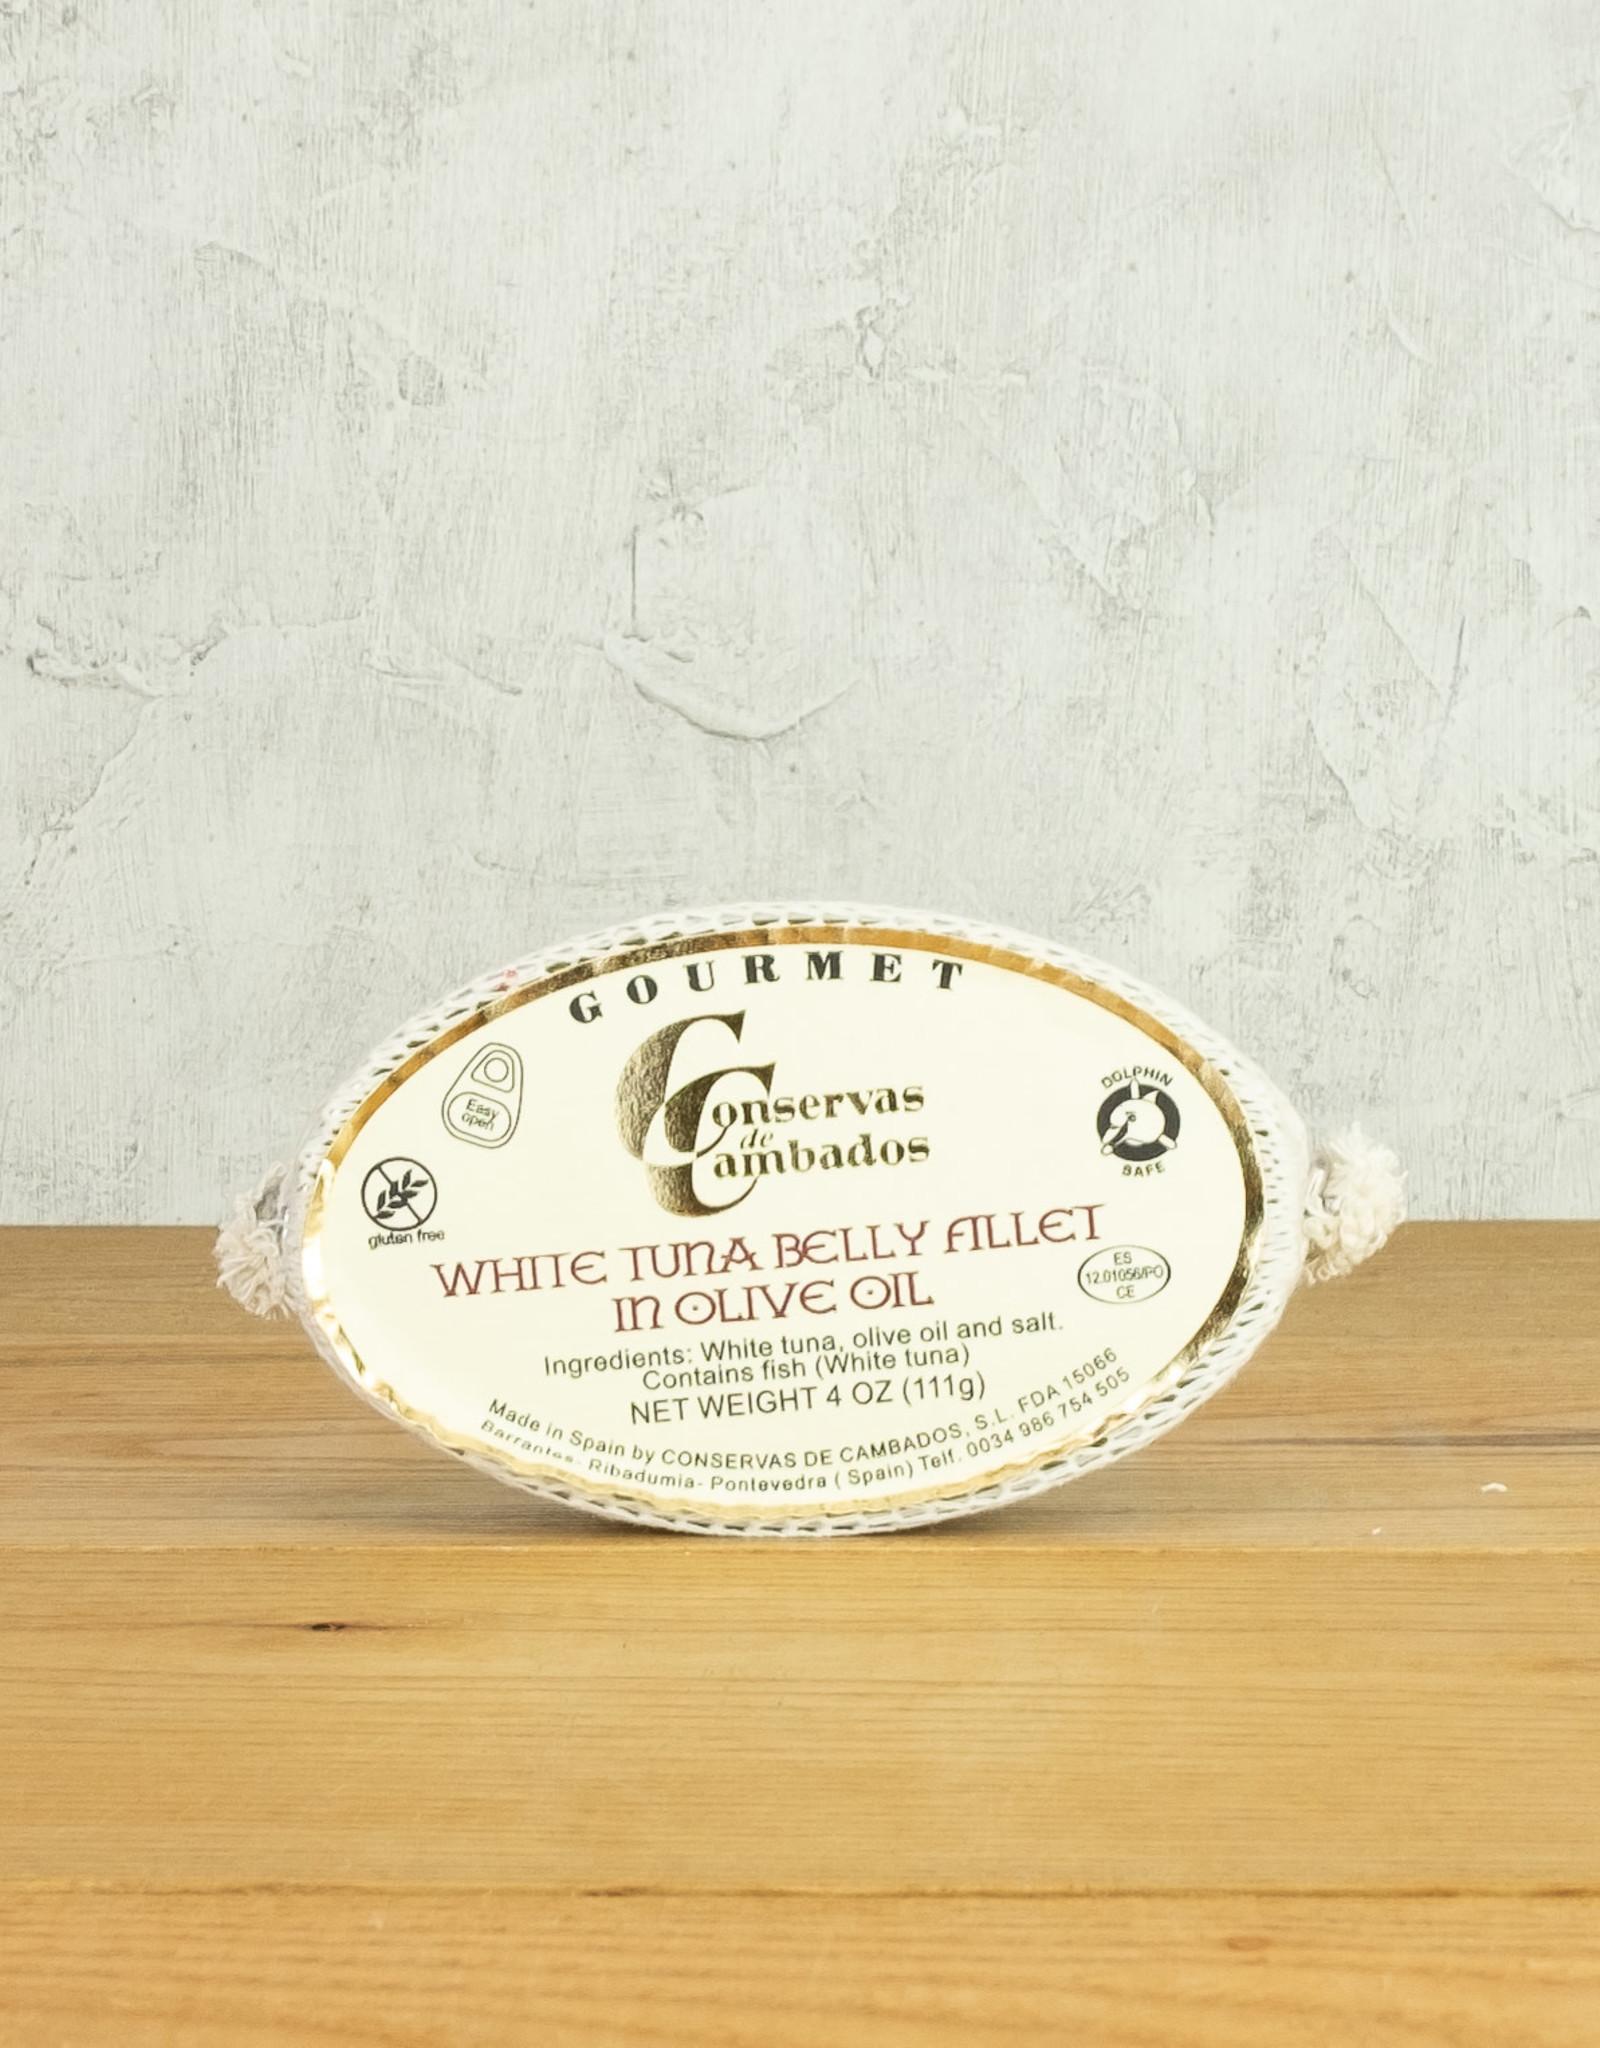 Conservas de Cambados White Tuna Belly Fillet in Olive Oil